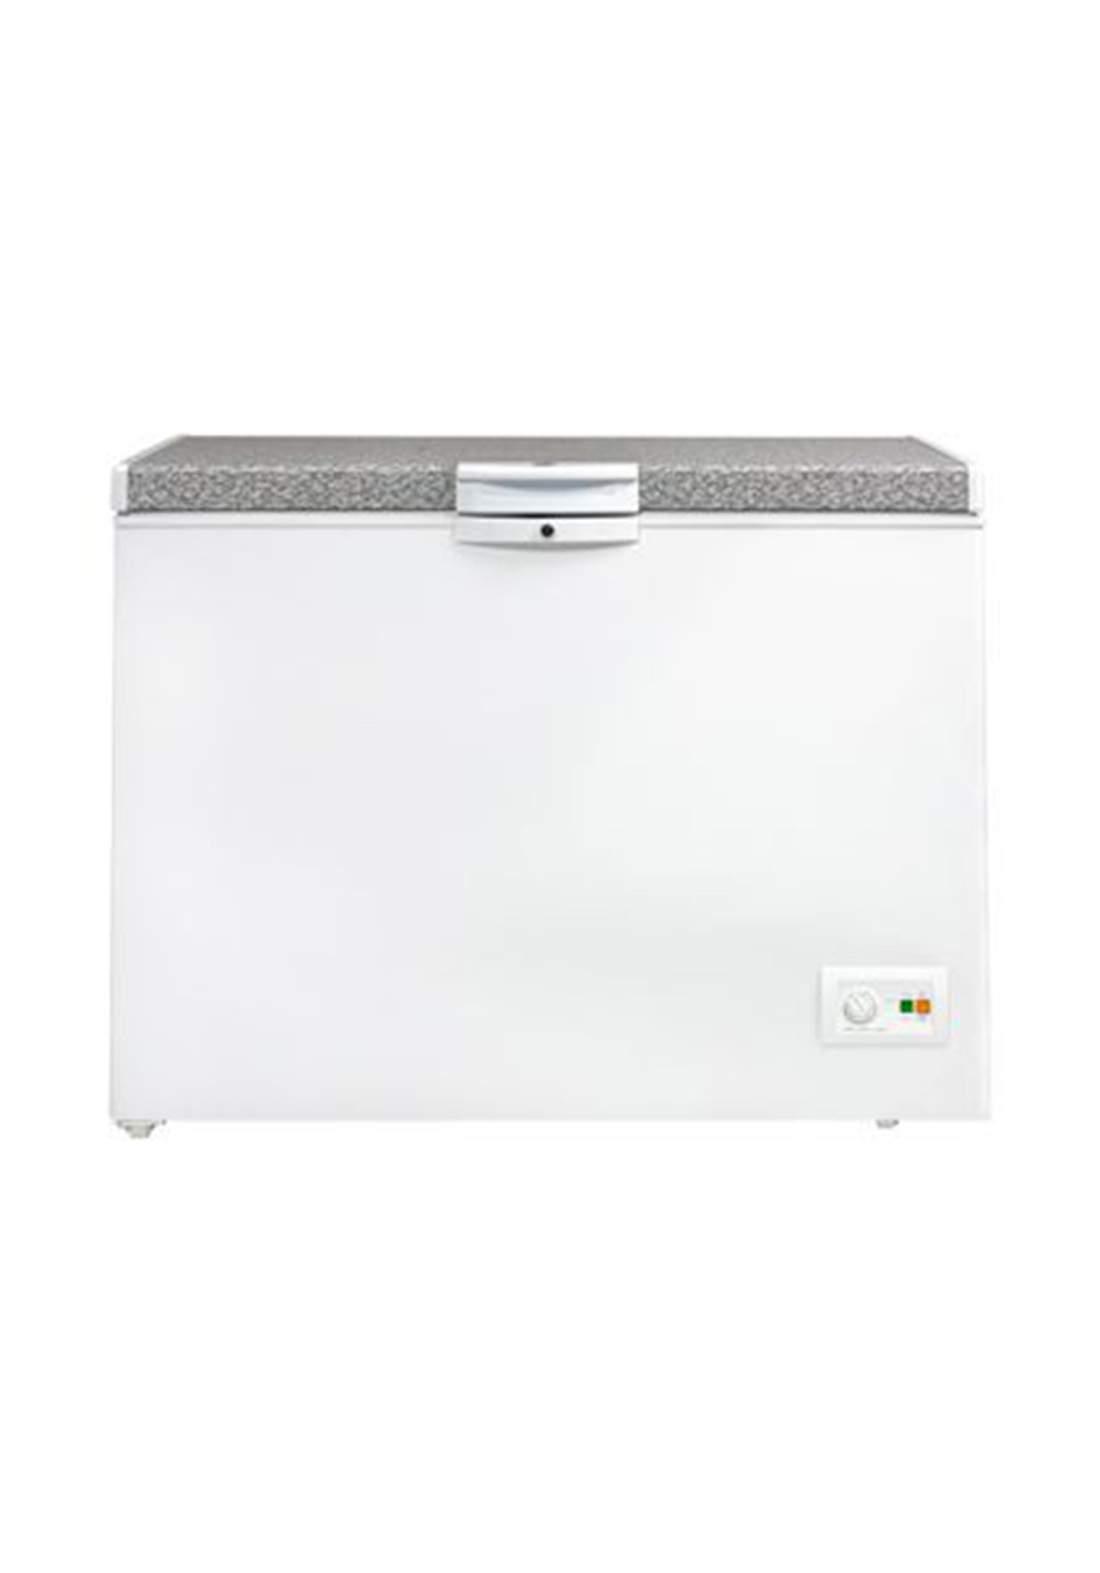 Beko HS305 Chest Freezer 9Ft - White